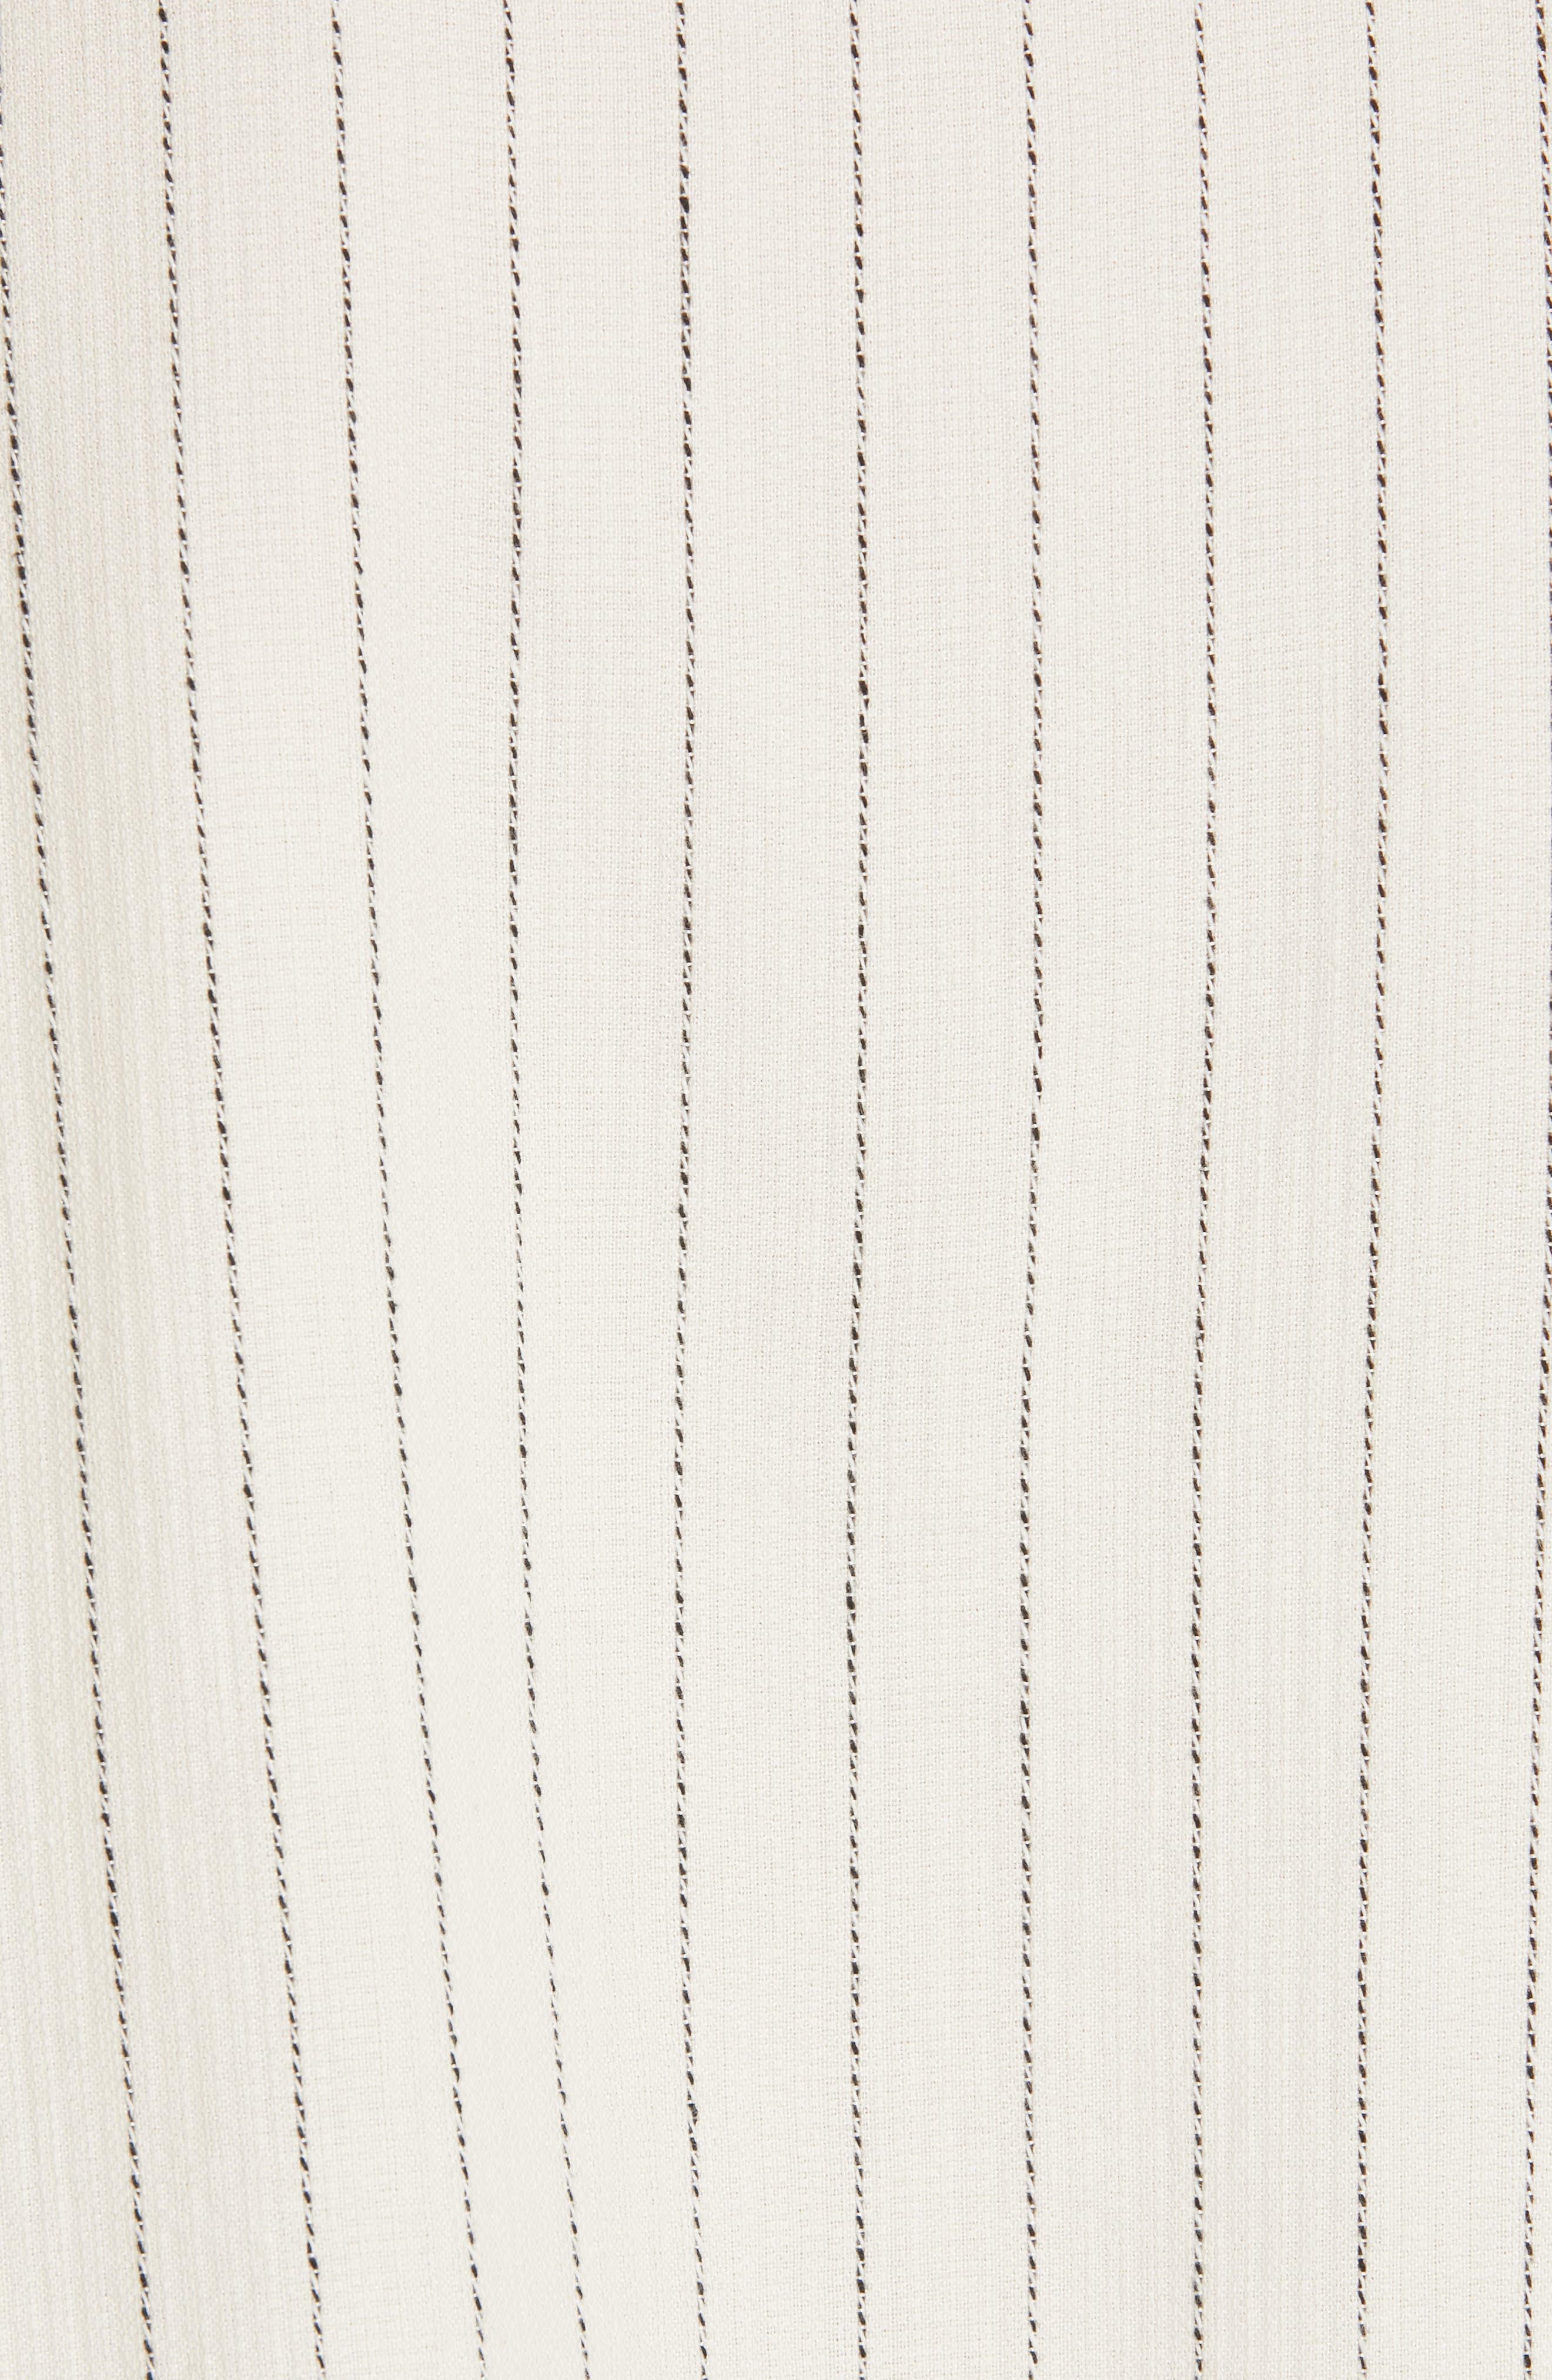 Stripe Bateau Neck Top,                             Alternate thumbnail 5, color,                             ECRU